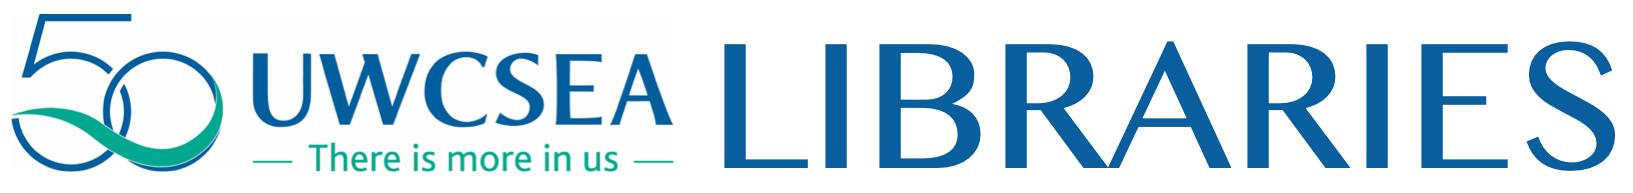 UWCSEA Libraries Logo